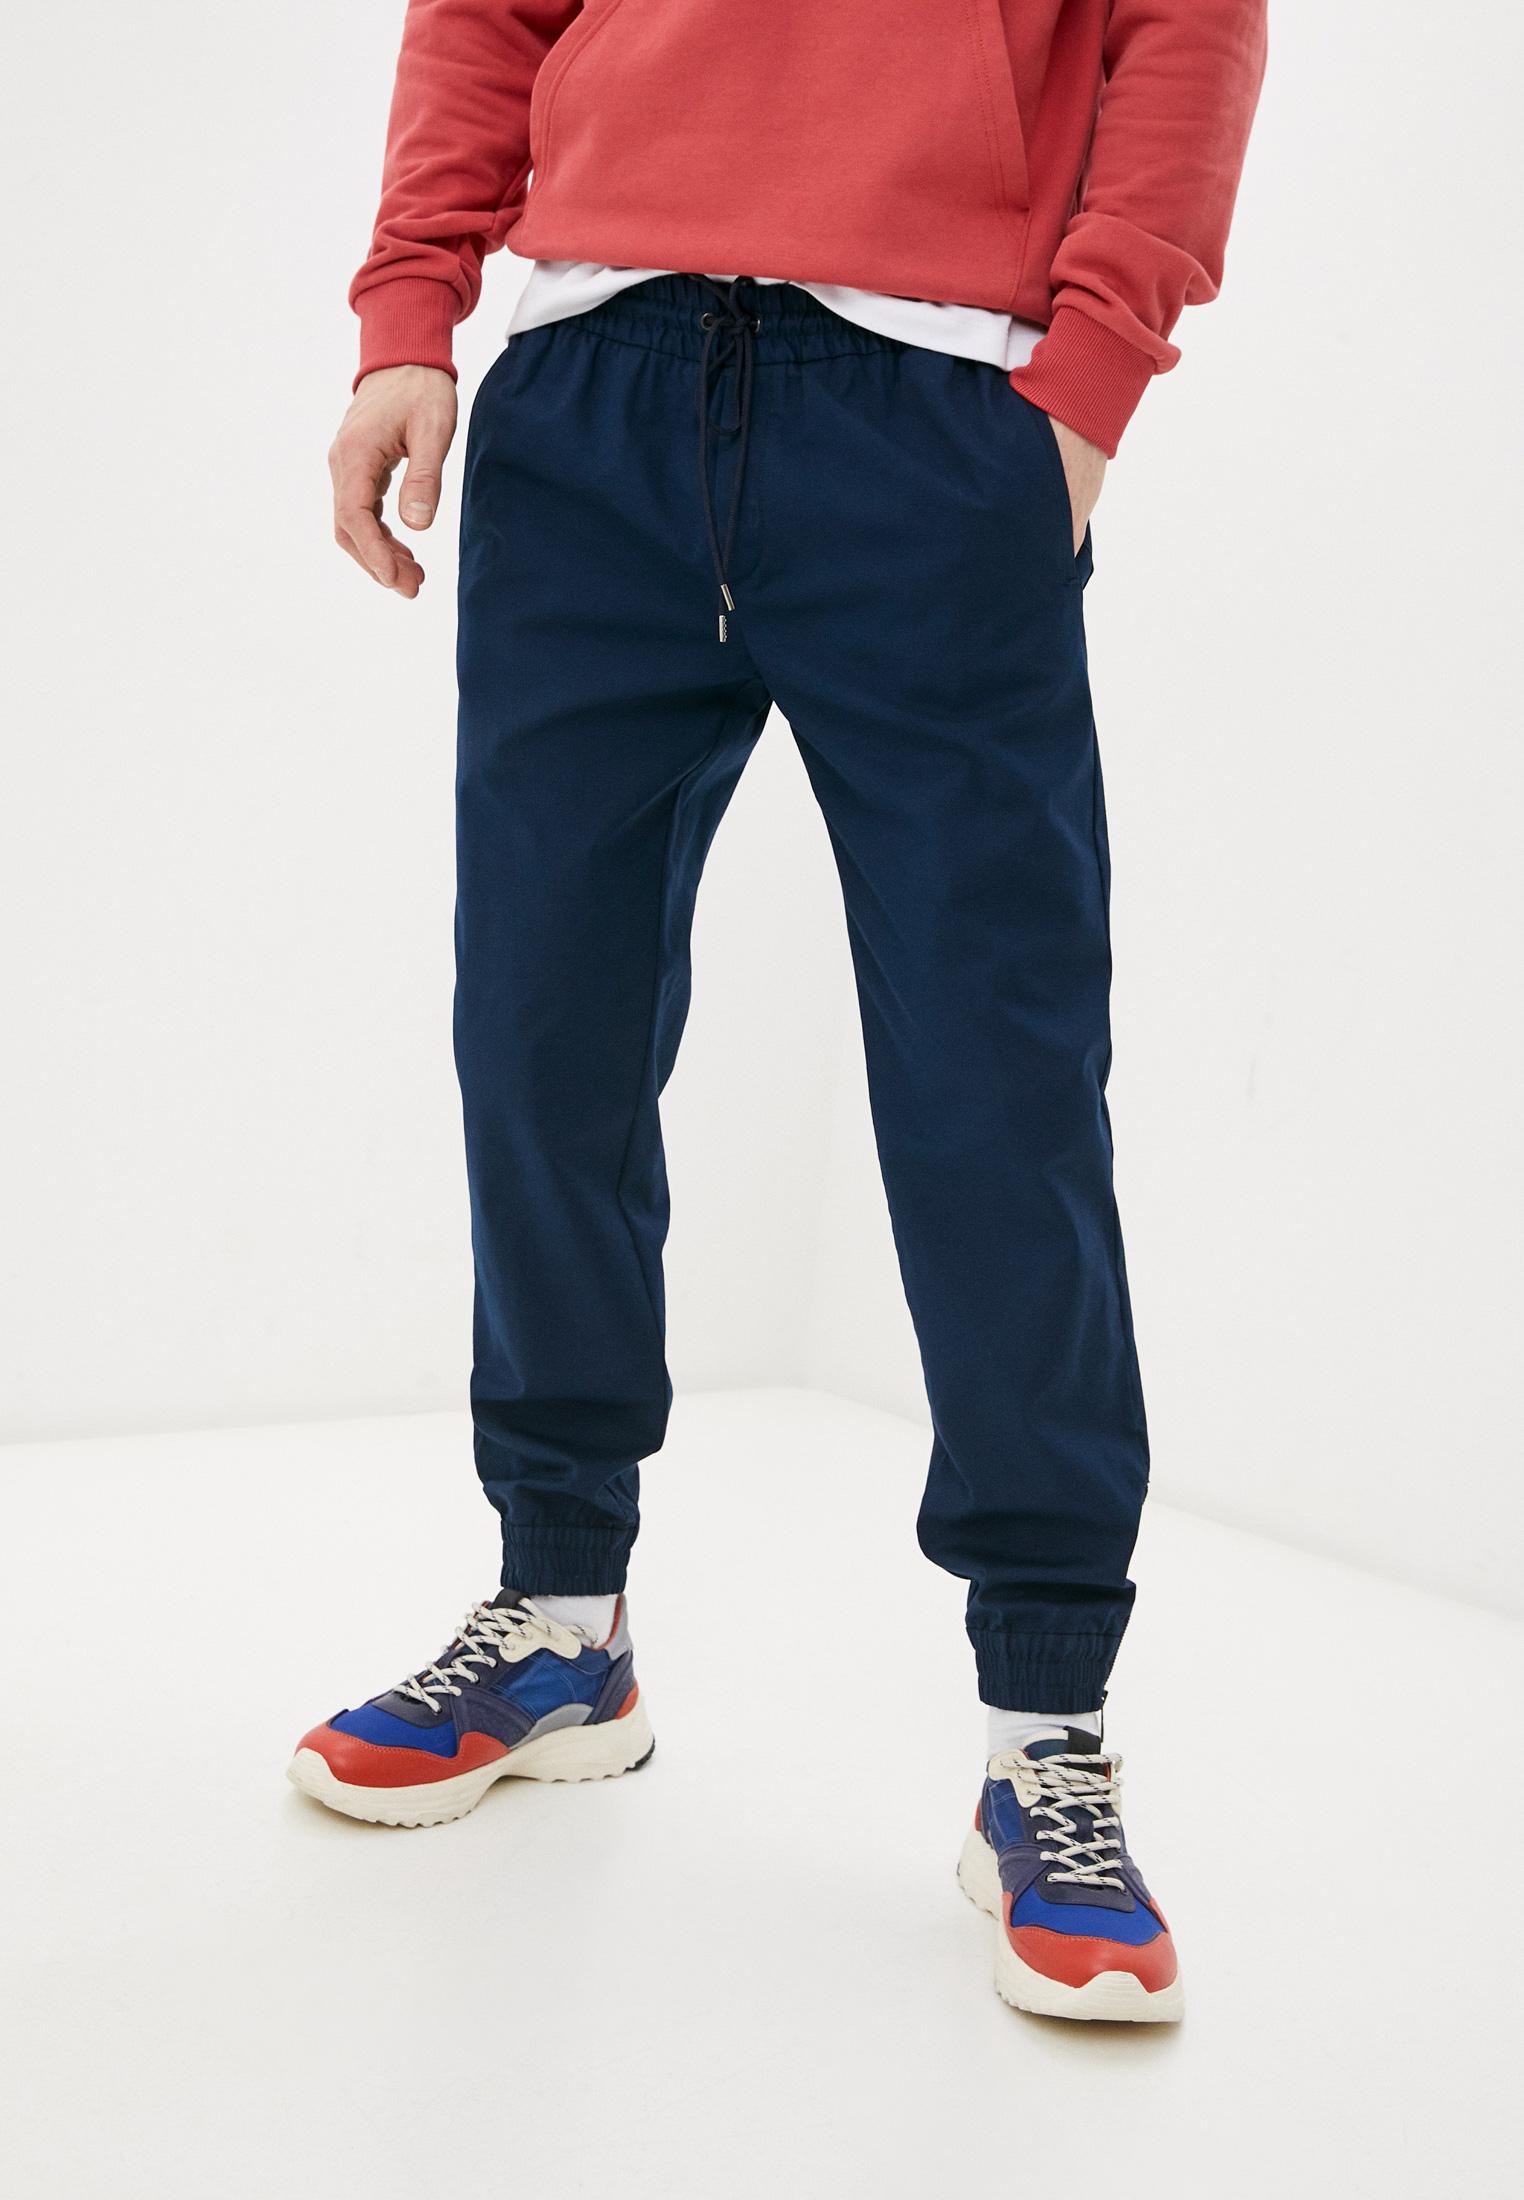 Мужские повседневные брюки Bikkembergs (Биккембергс) CP01201S3249Y91